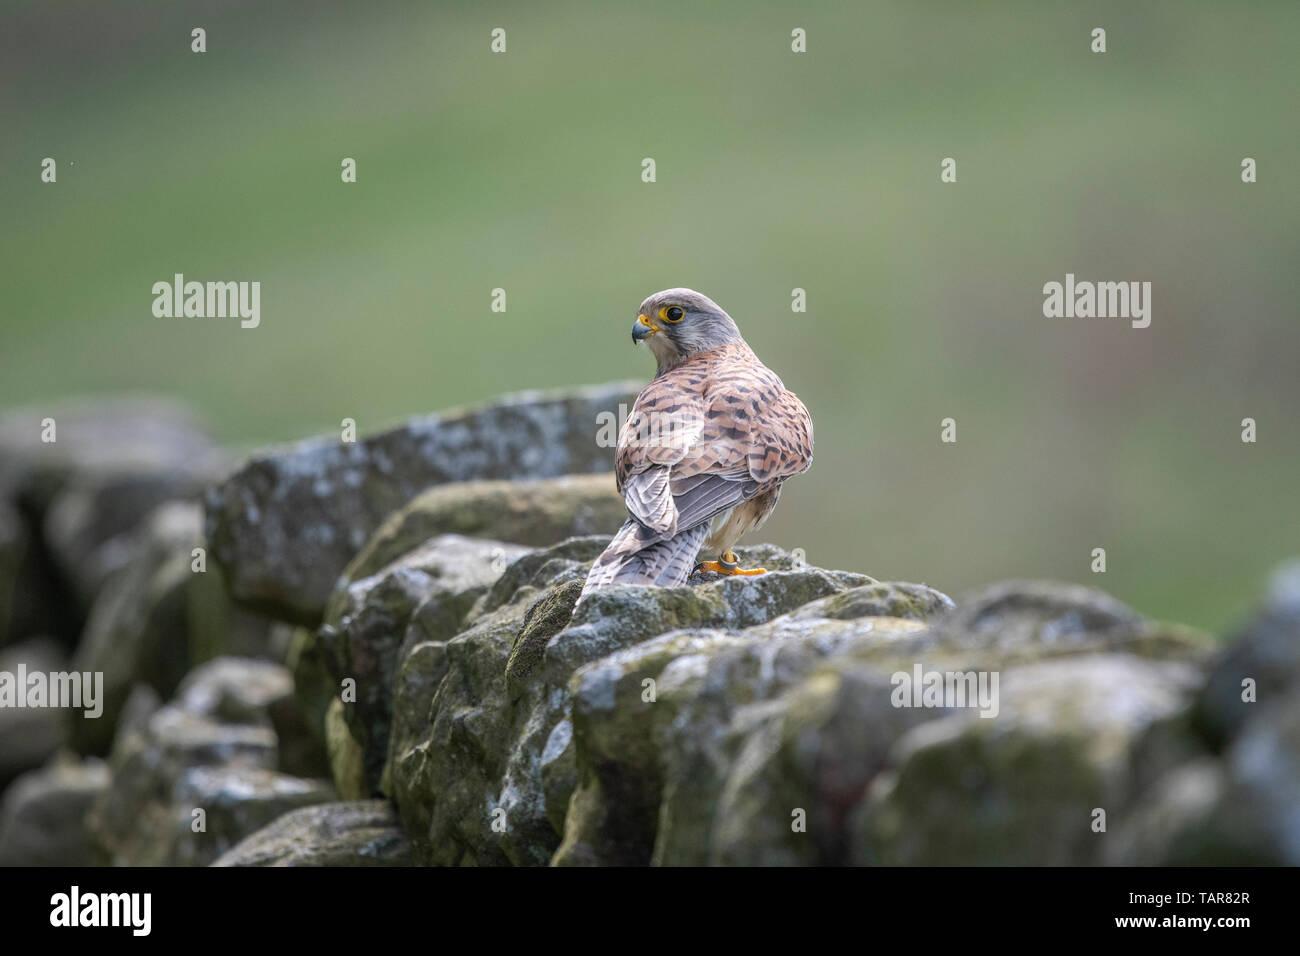 Female kestrel (Falco tinnunculus) on wall - Stock Image